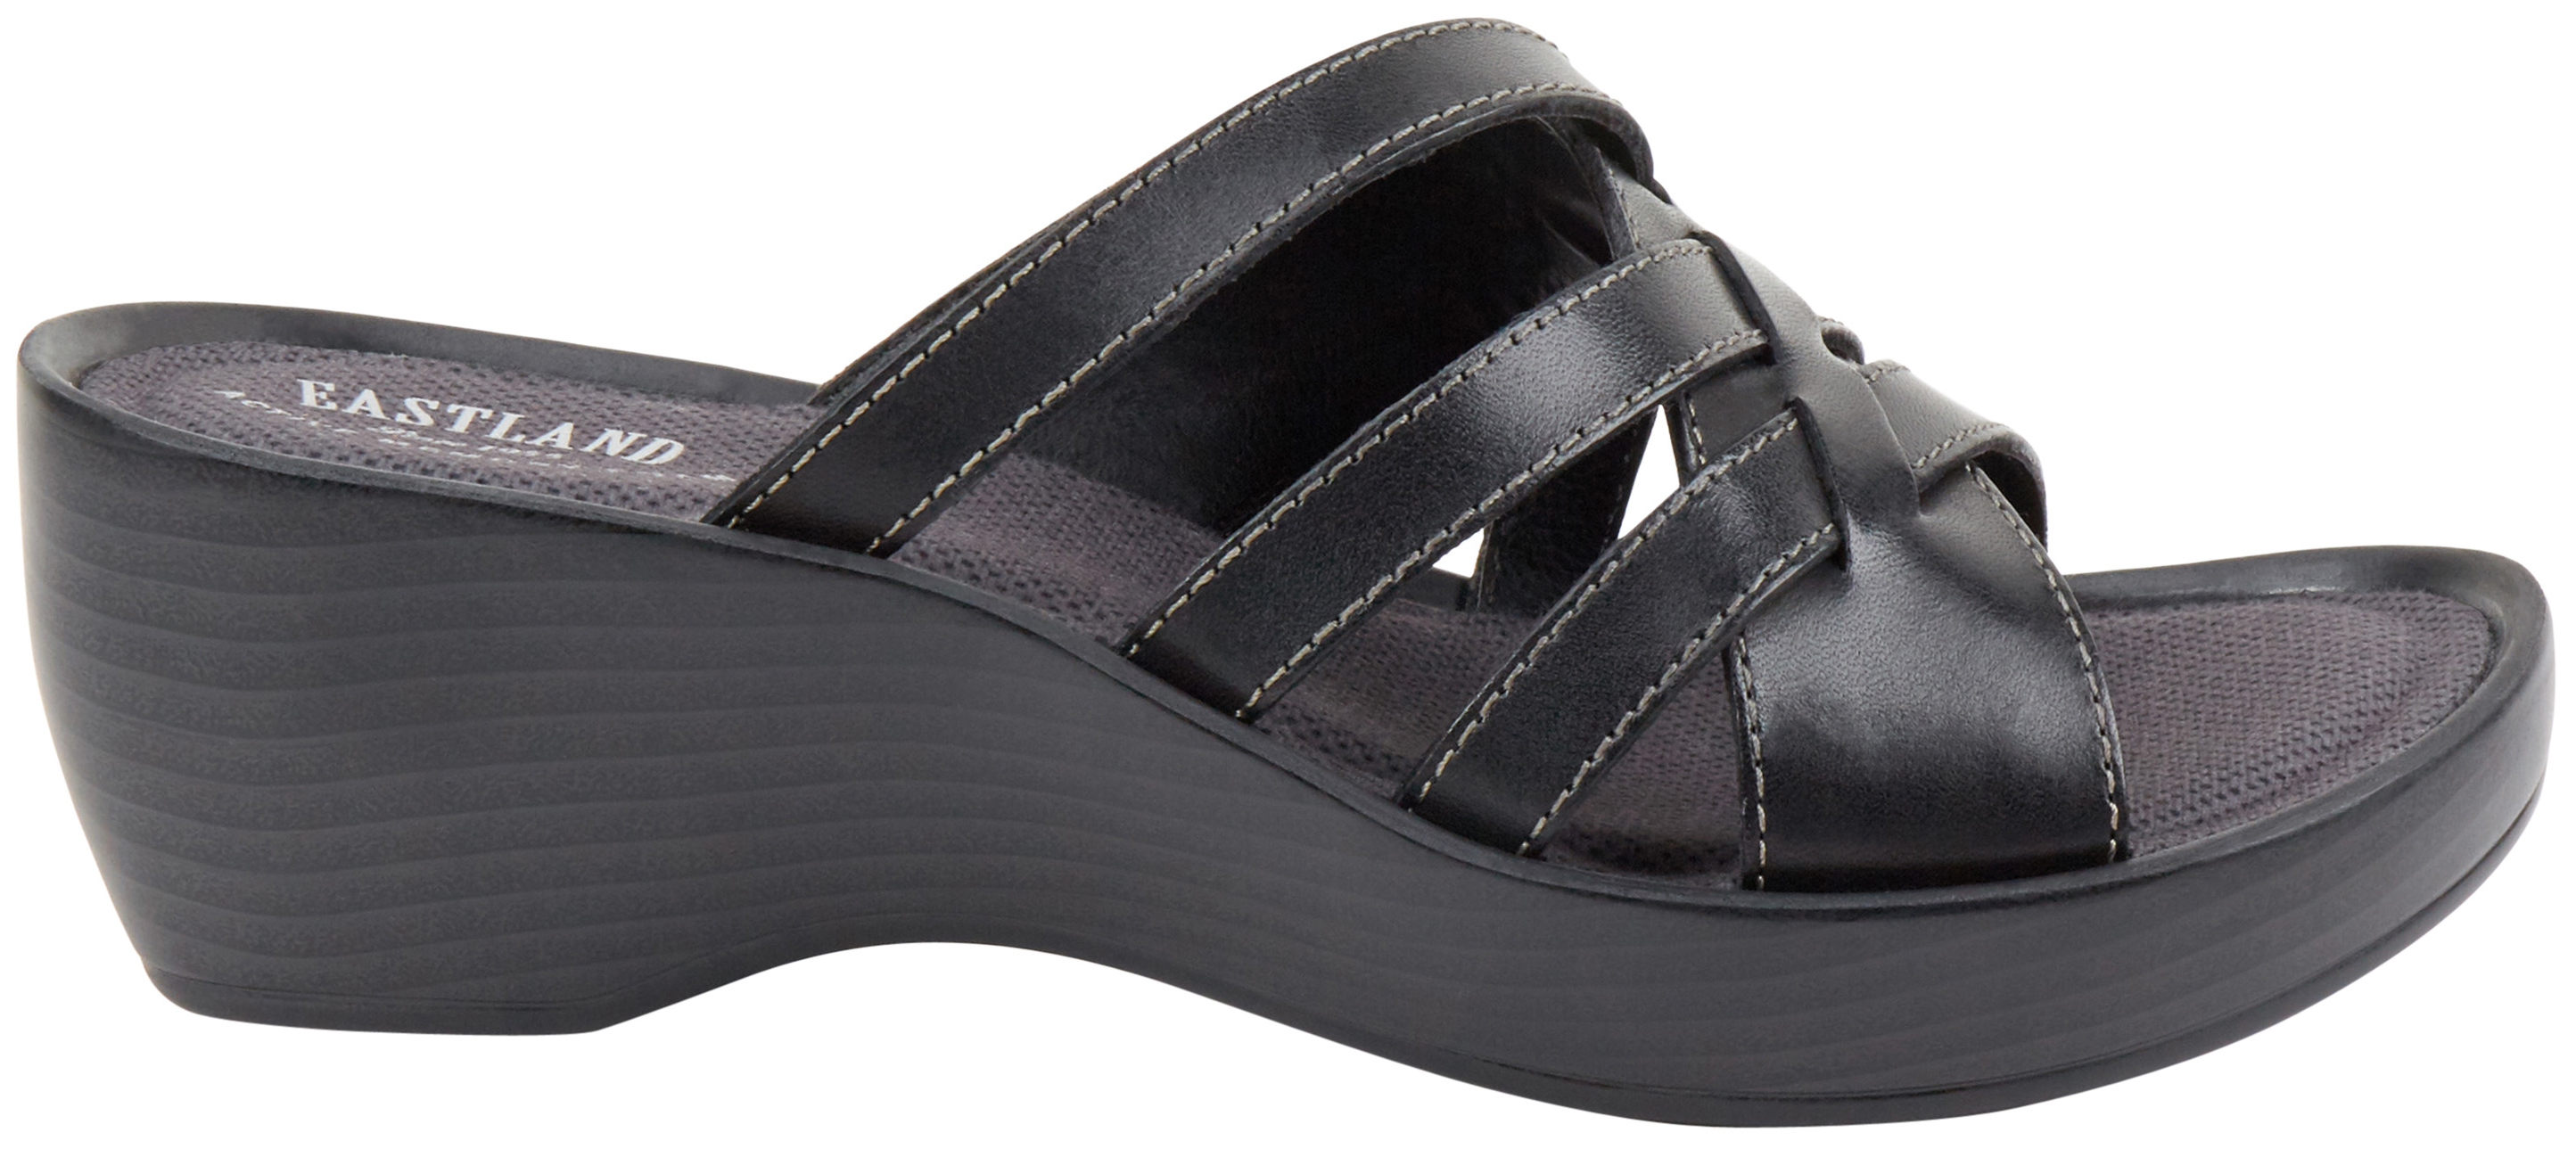 Black poppy sandals - Eastland Women S Black Poppy Wedge Sandals Black Hi Res